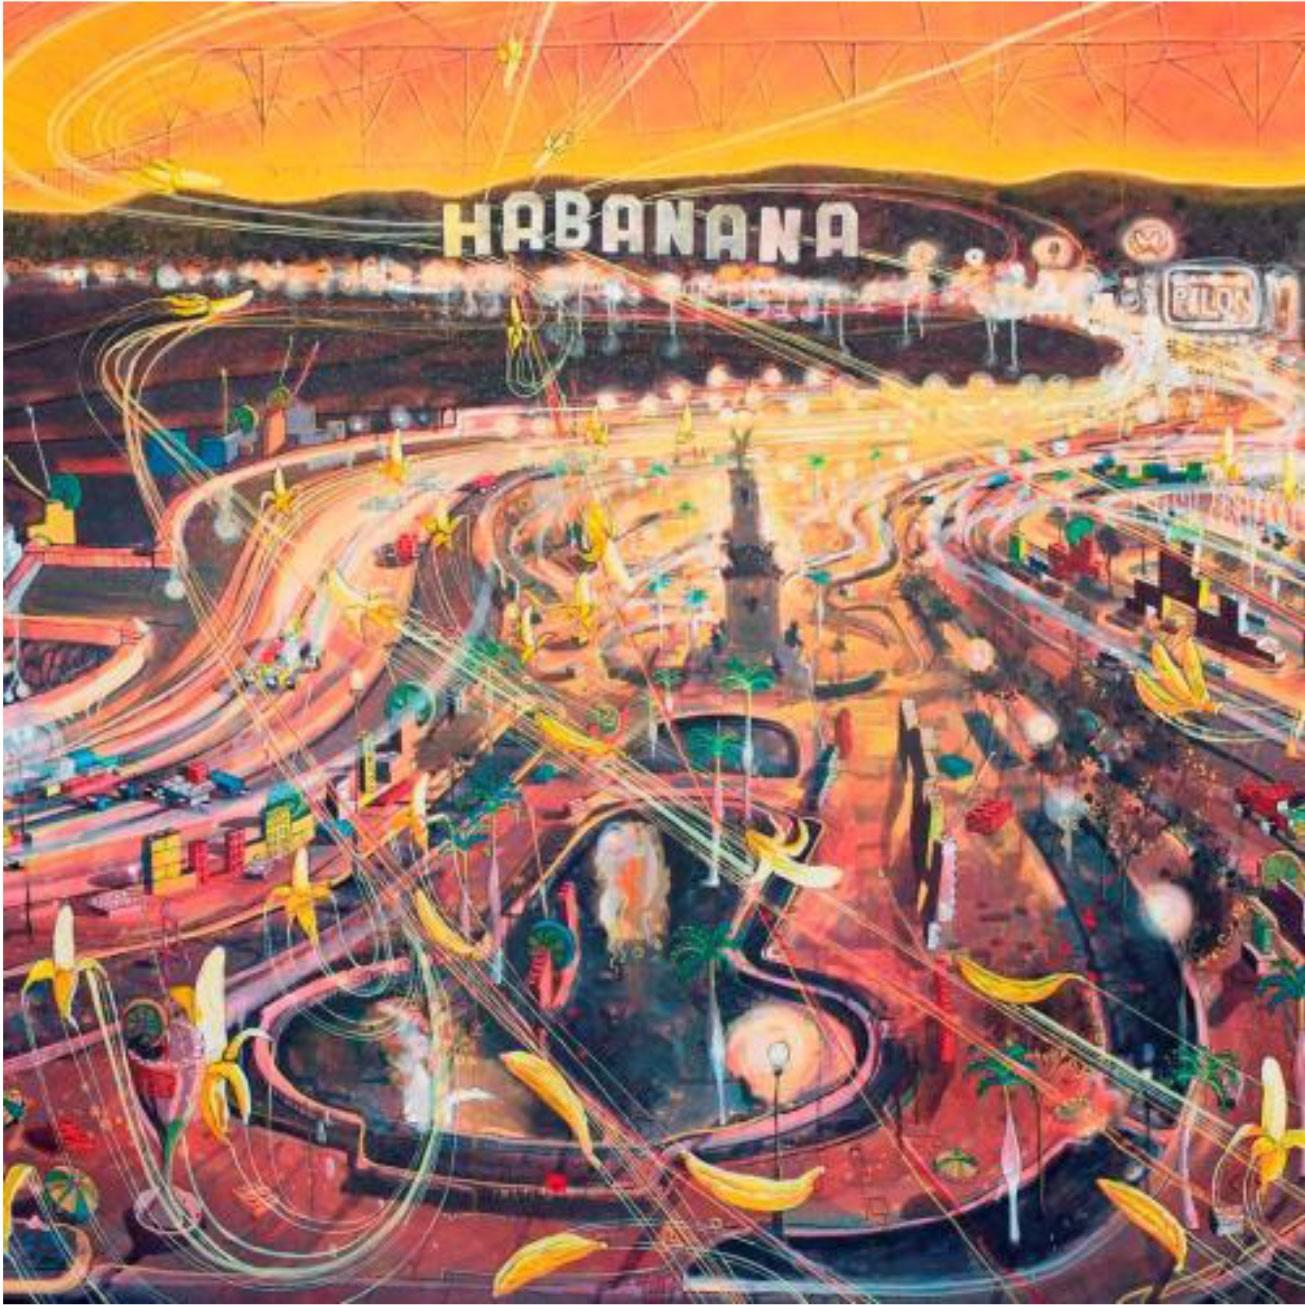 Douglas Pérez The great Banana Republic Oil on canvas, 2012